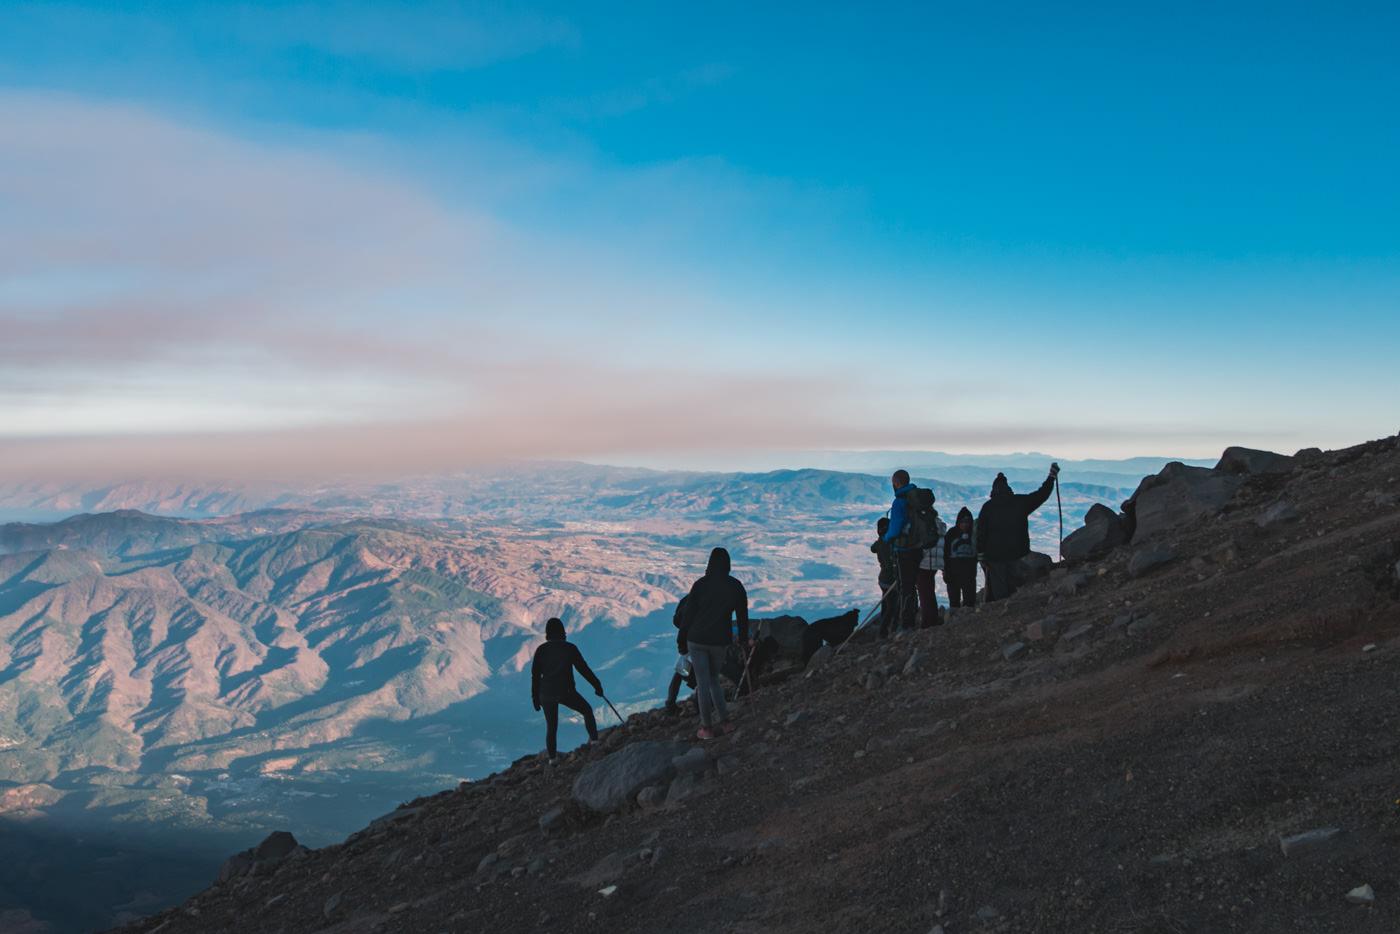 Auf dem Gipfel des Vulkans Acatenango